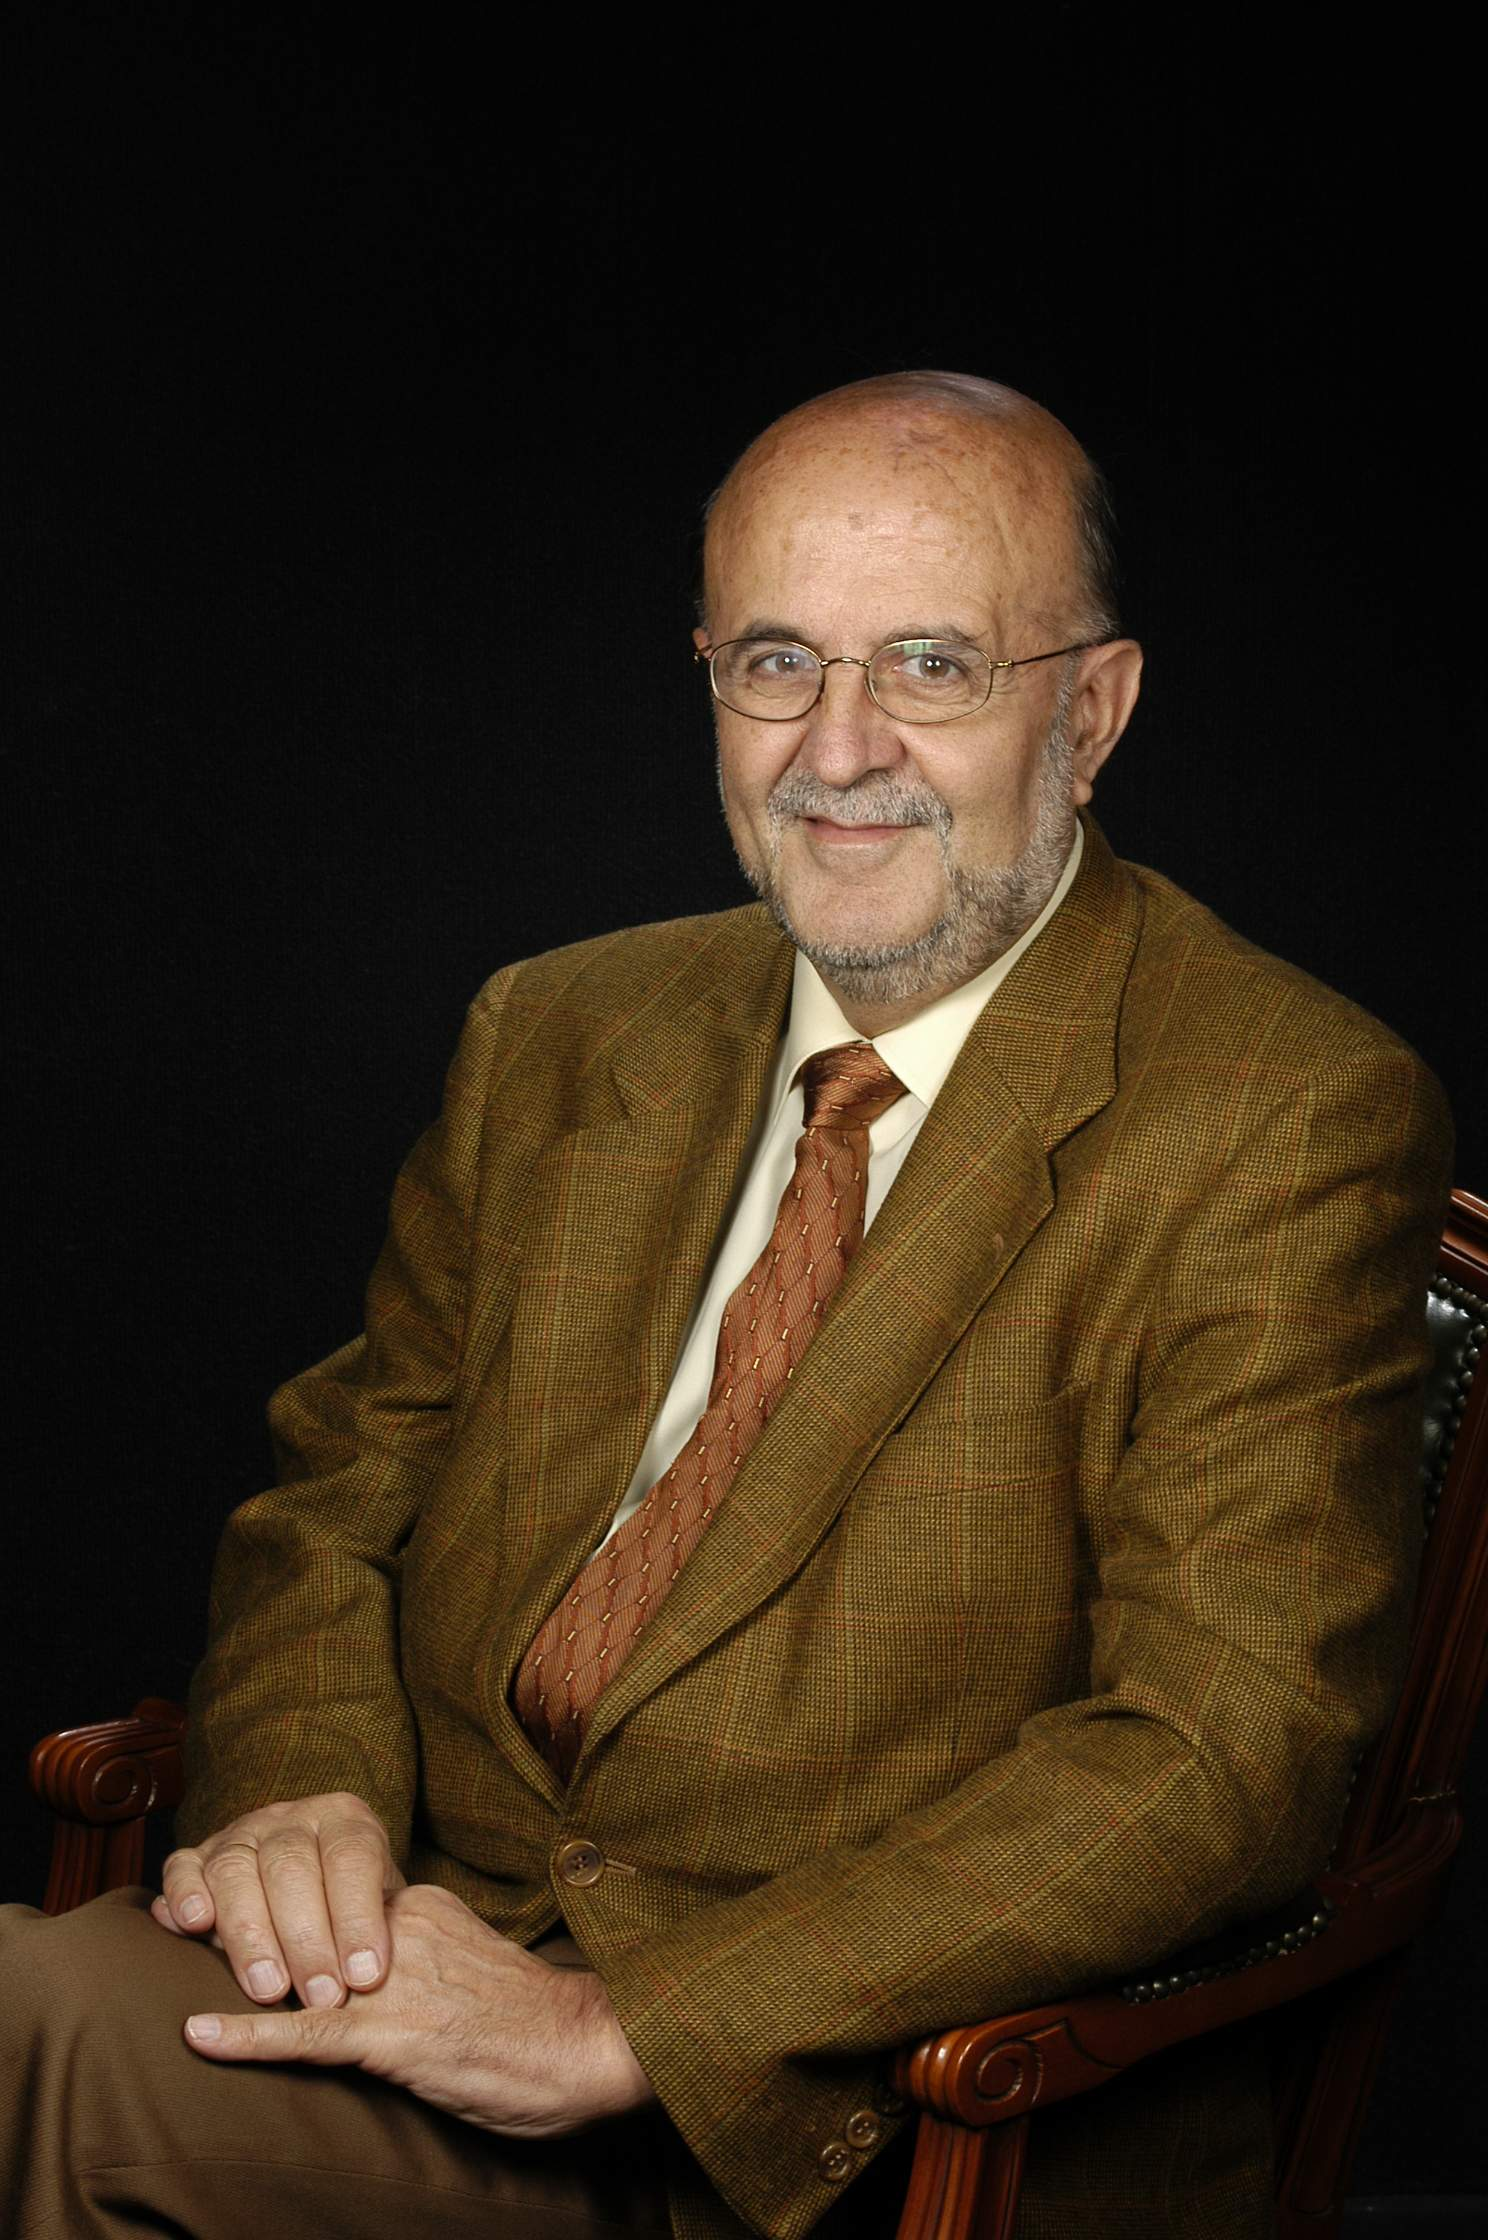 Dr. Eduard Castells Cuch